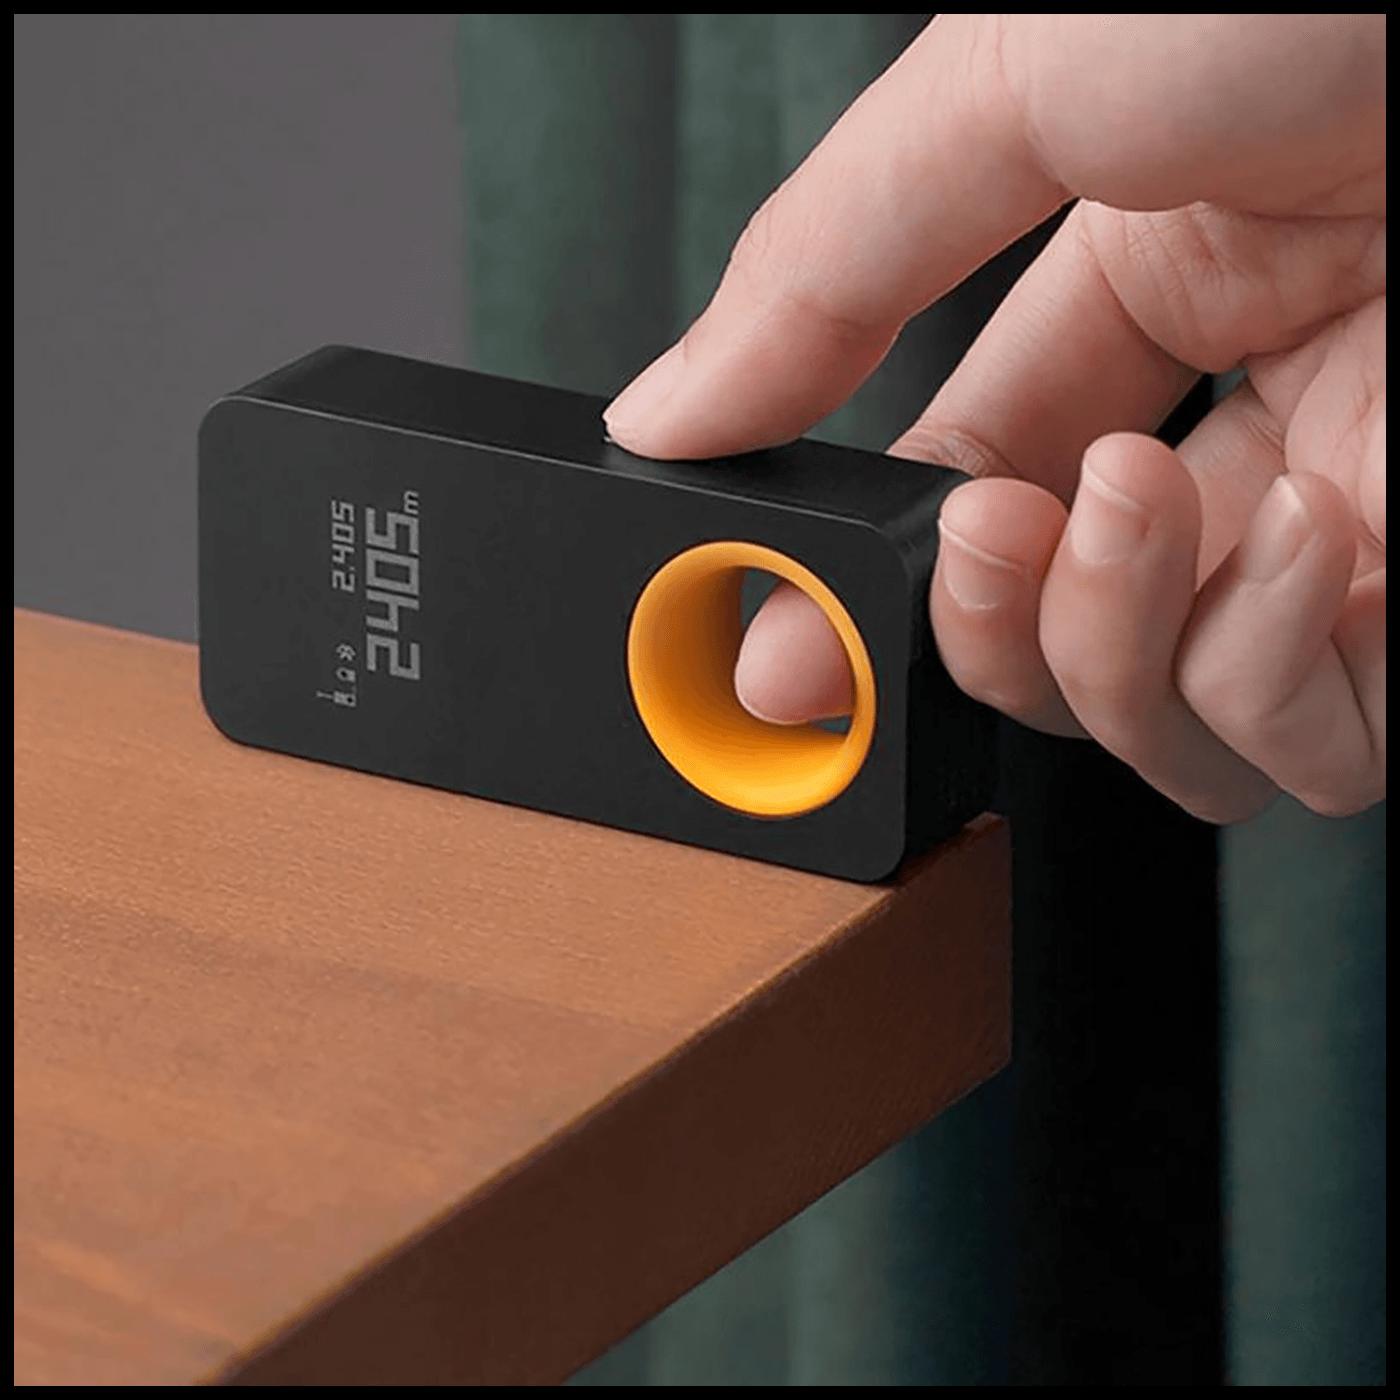 Pametni metar, laserski, Bluetooth